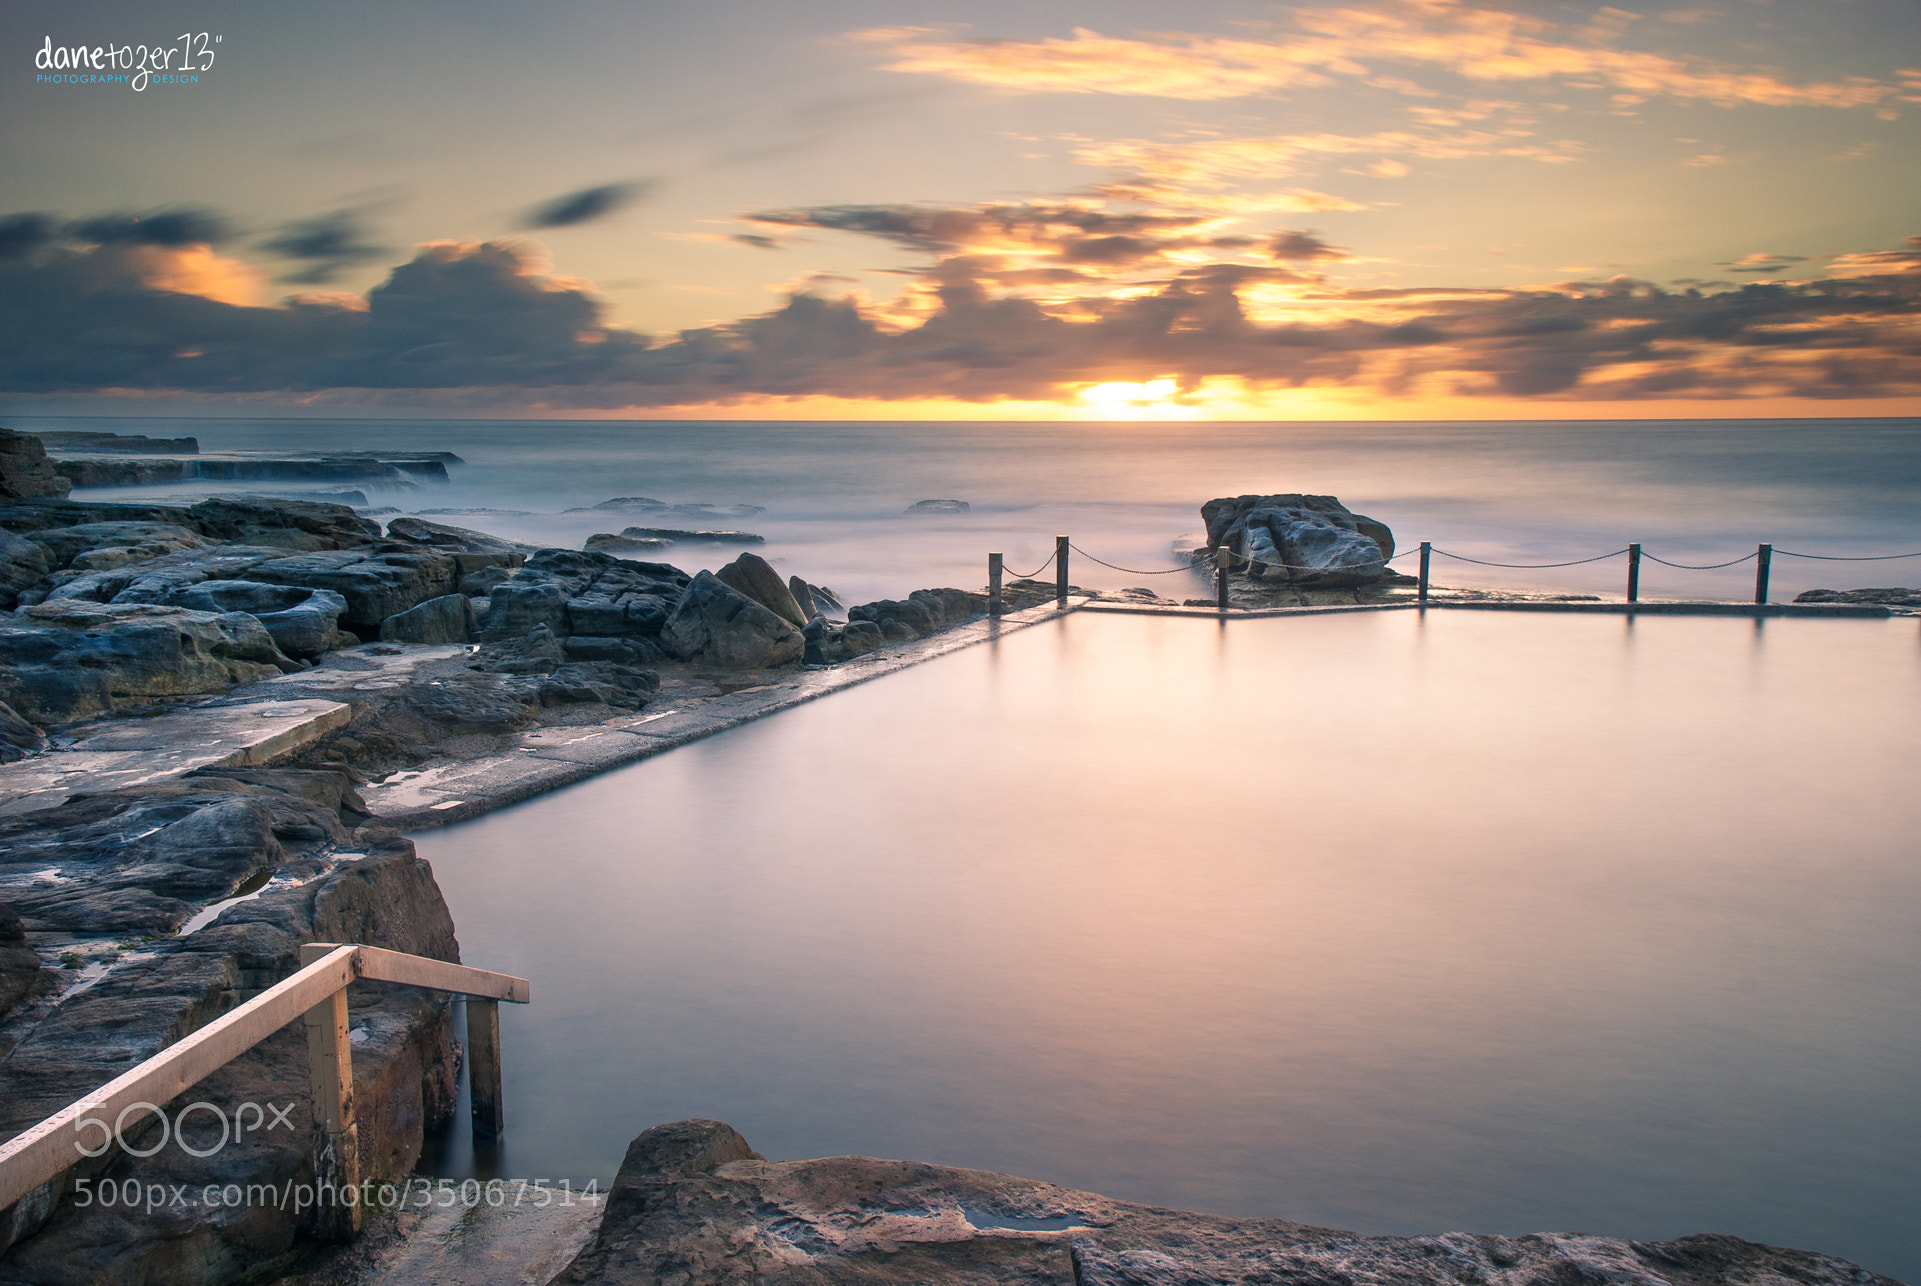 Photograph Mahon pool colours by Dane Tozer on 500px